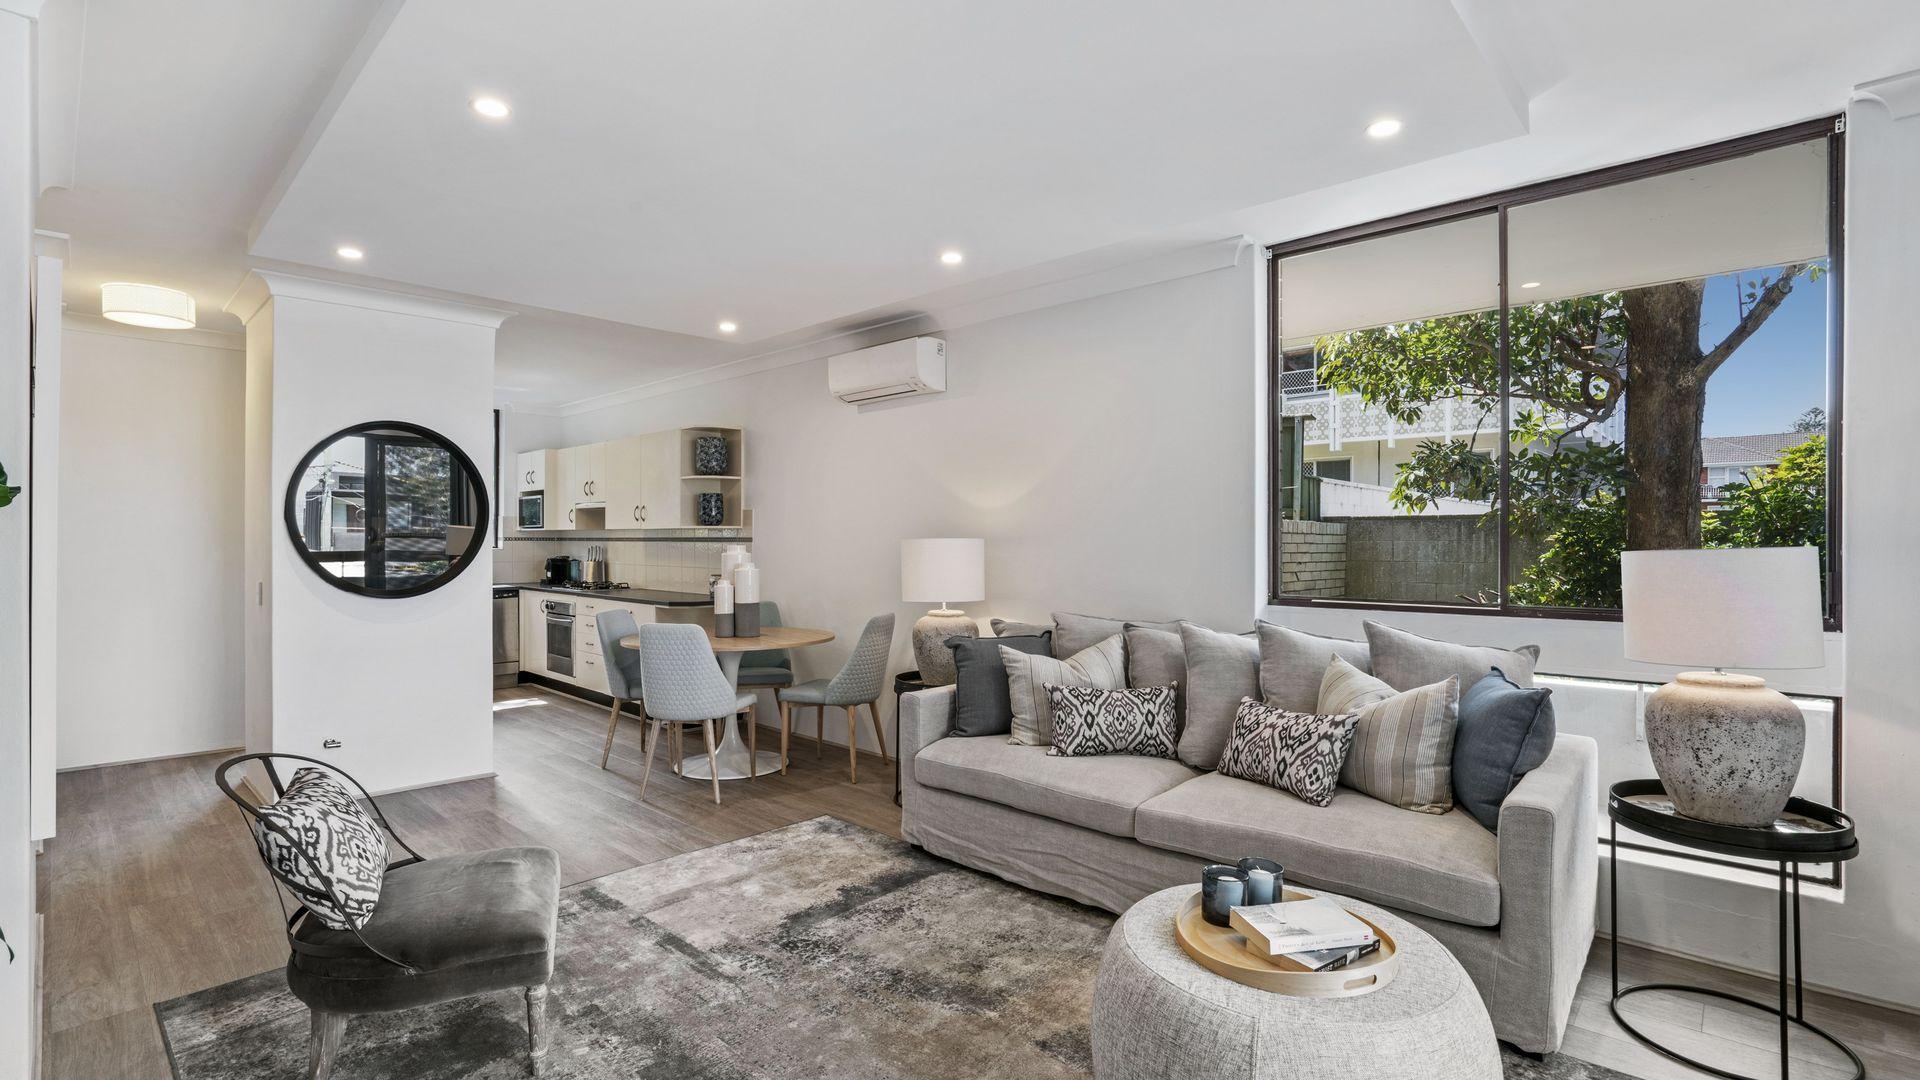 5/44 Fairlight Street, Fairlight NSW 2094, Image 1